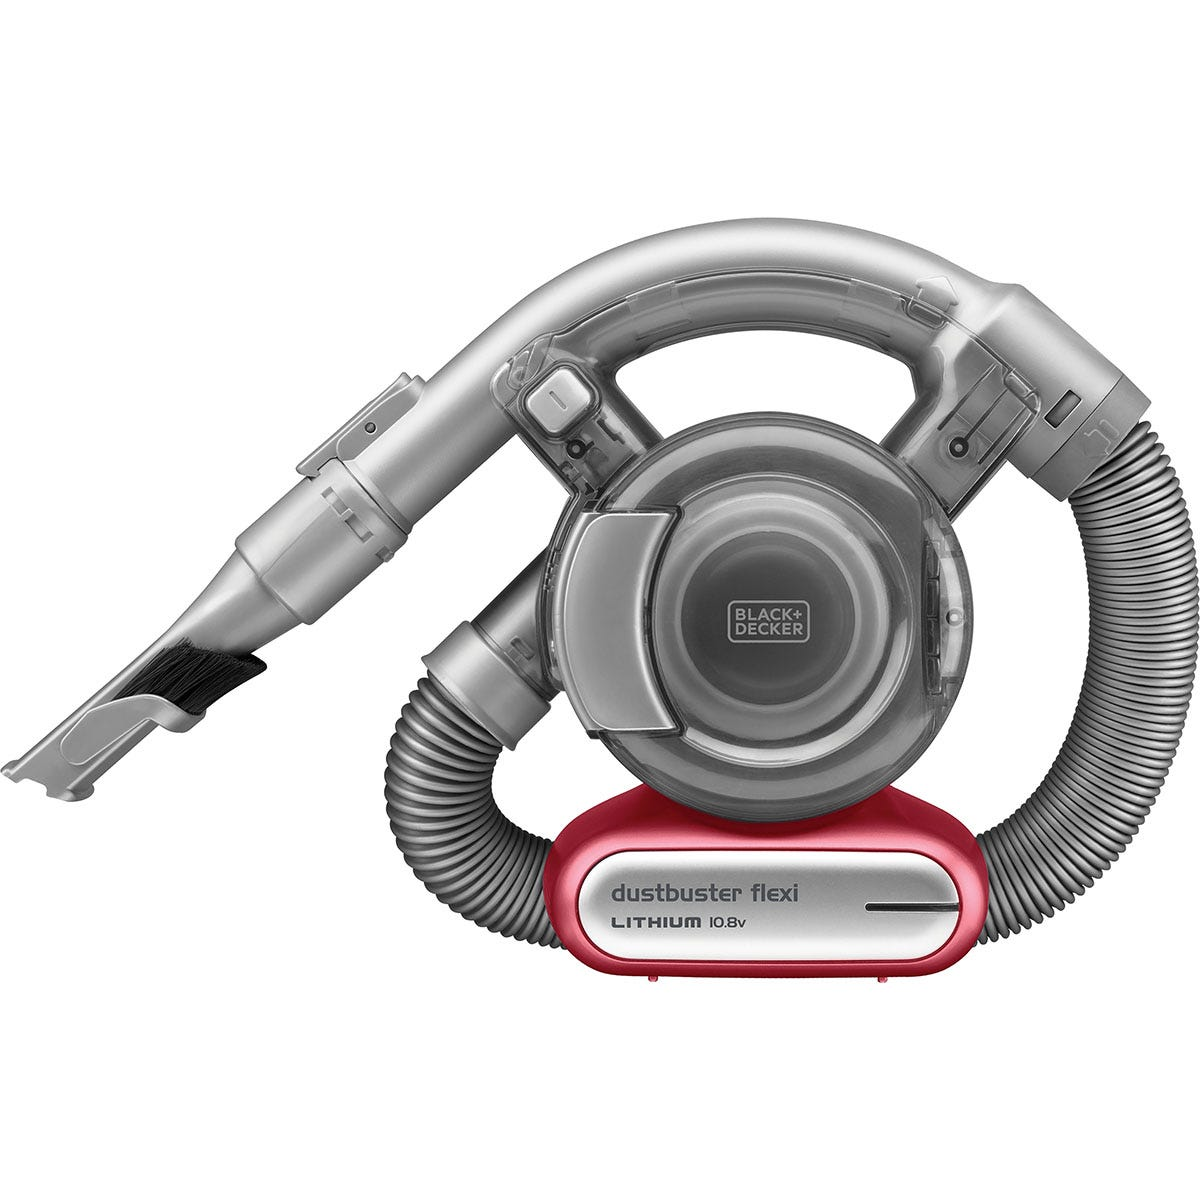 Black & Decker Black + Decker PD1020L-GB Flexi Dustbuster 10.8V Cordless Handheld Vacuum Cleaner - Grey/Red